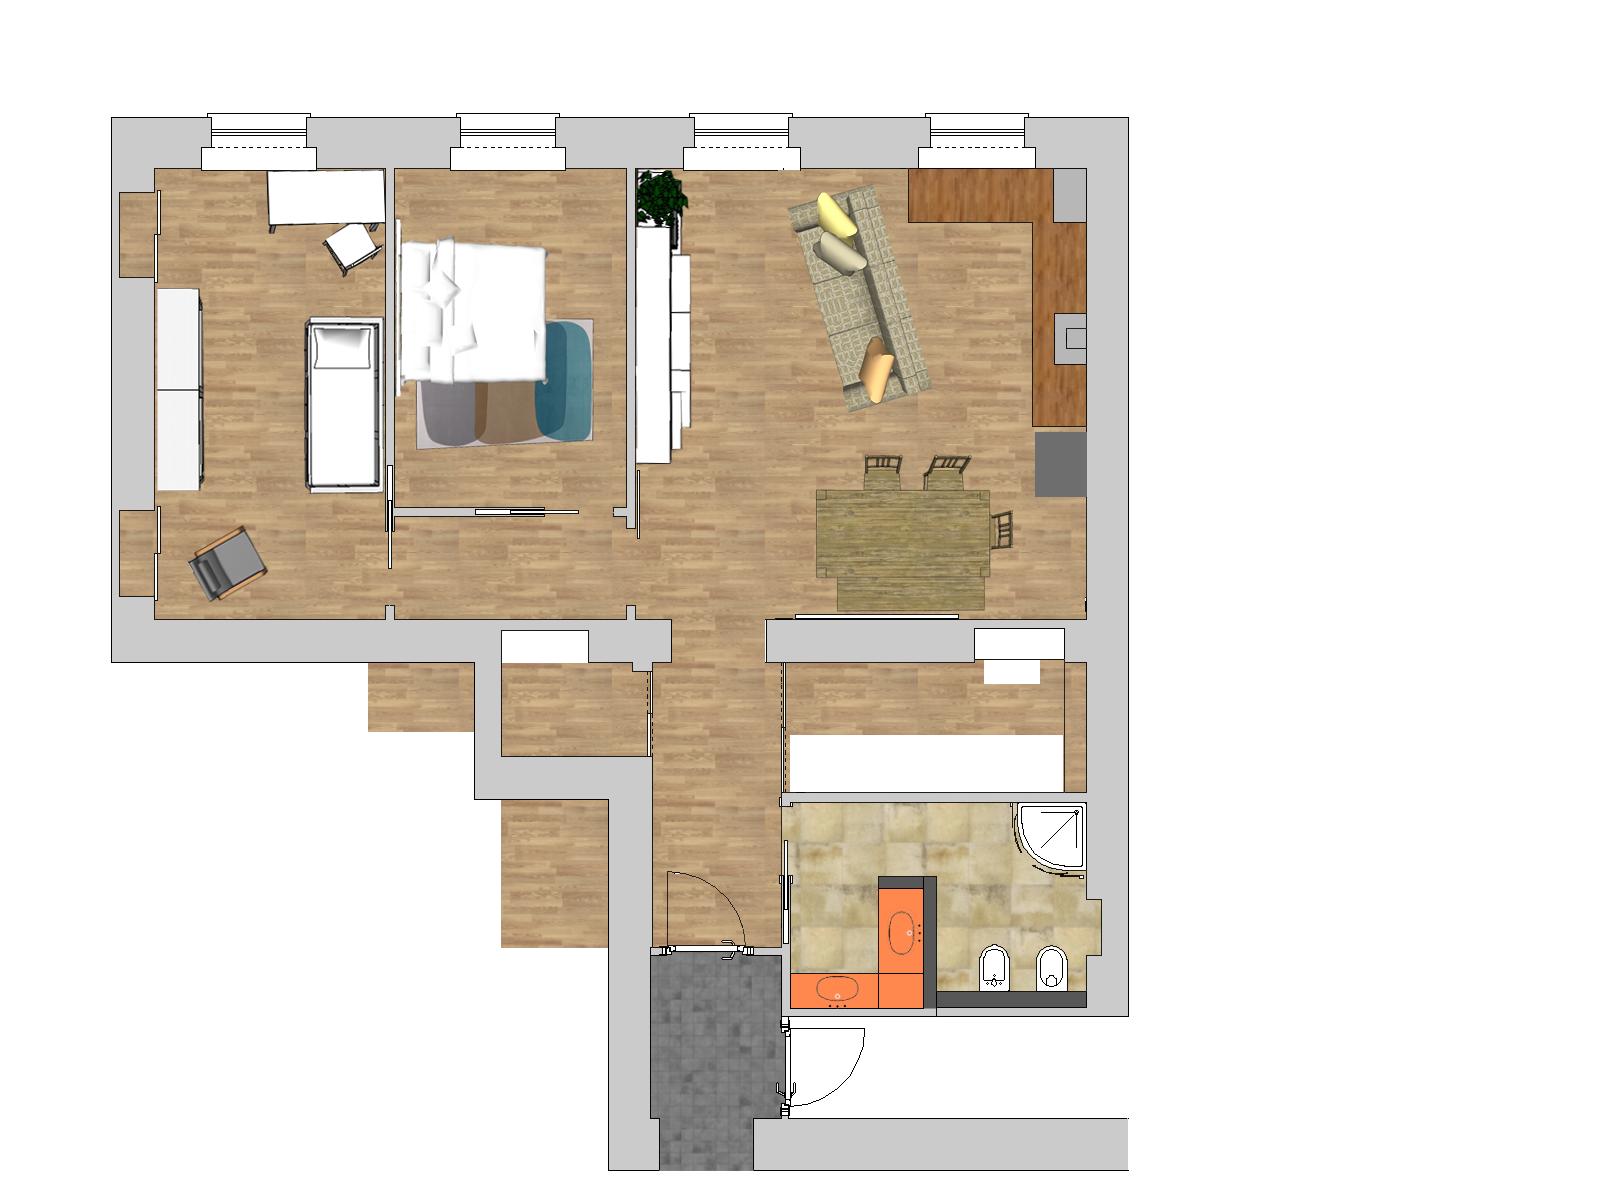 Planimetria divani la scelta giusta variata sul design for Planimetrie della casa estiva